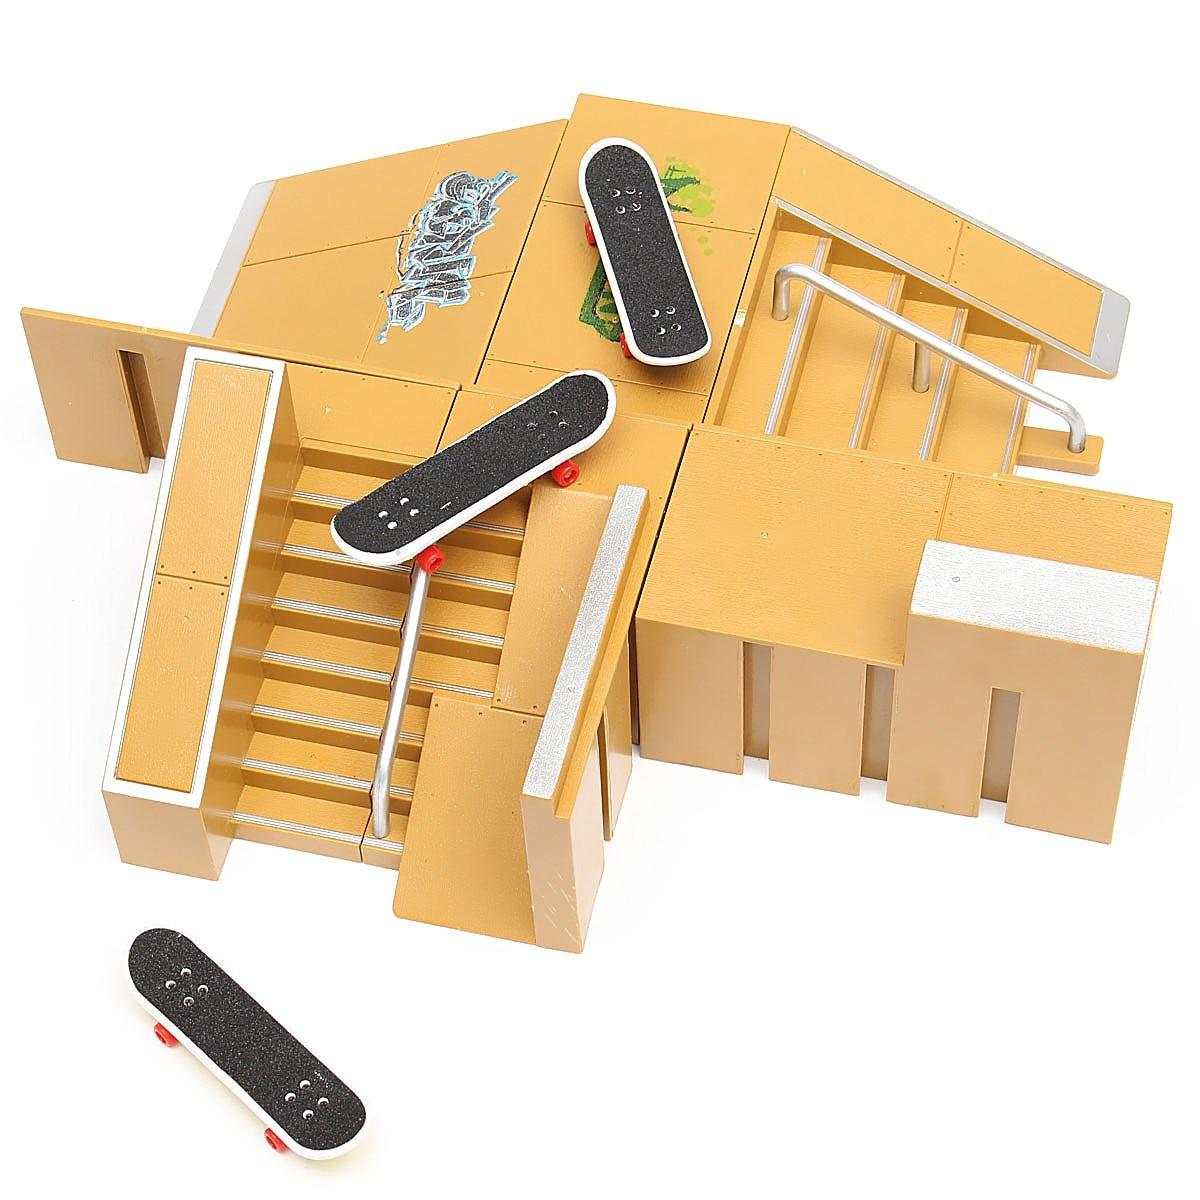 Skate Park Ramp Parts for Tech Deck Fingerboard Finger Board Parks Xmas Gift US